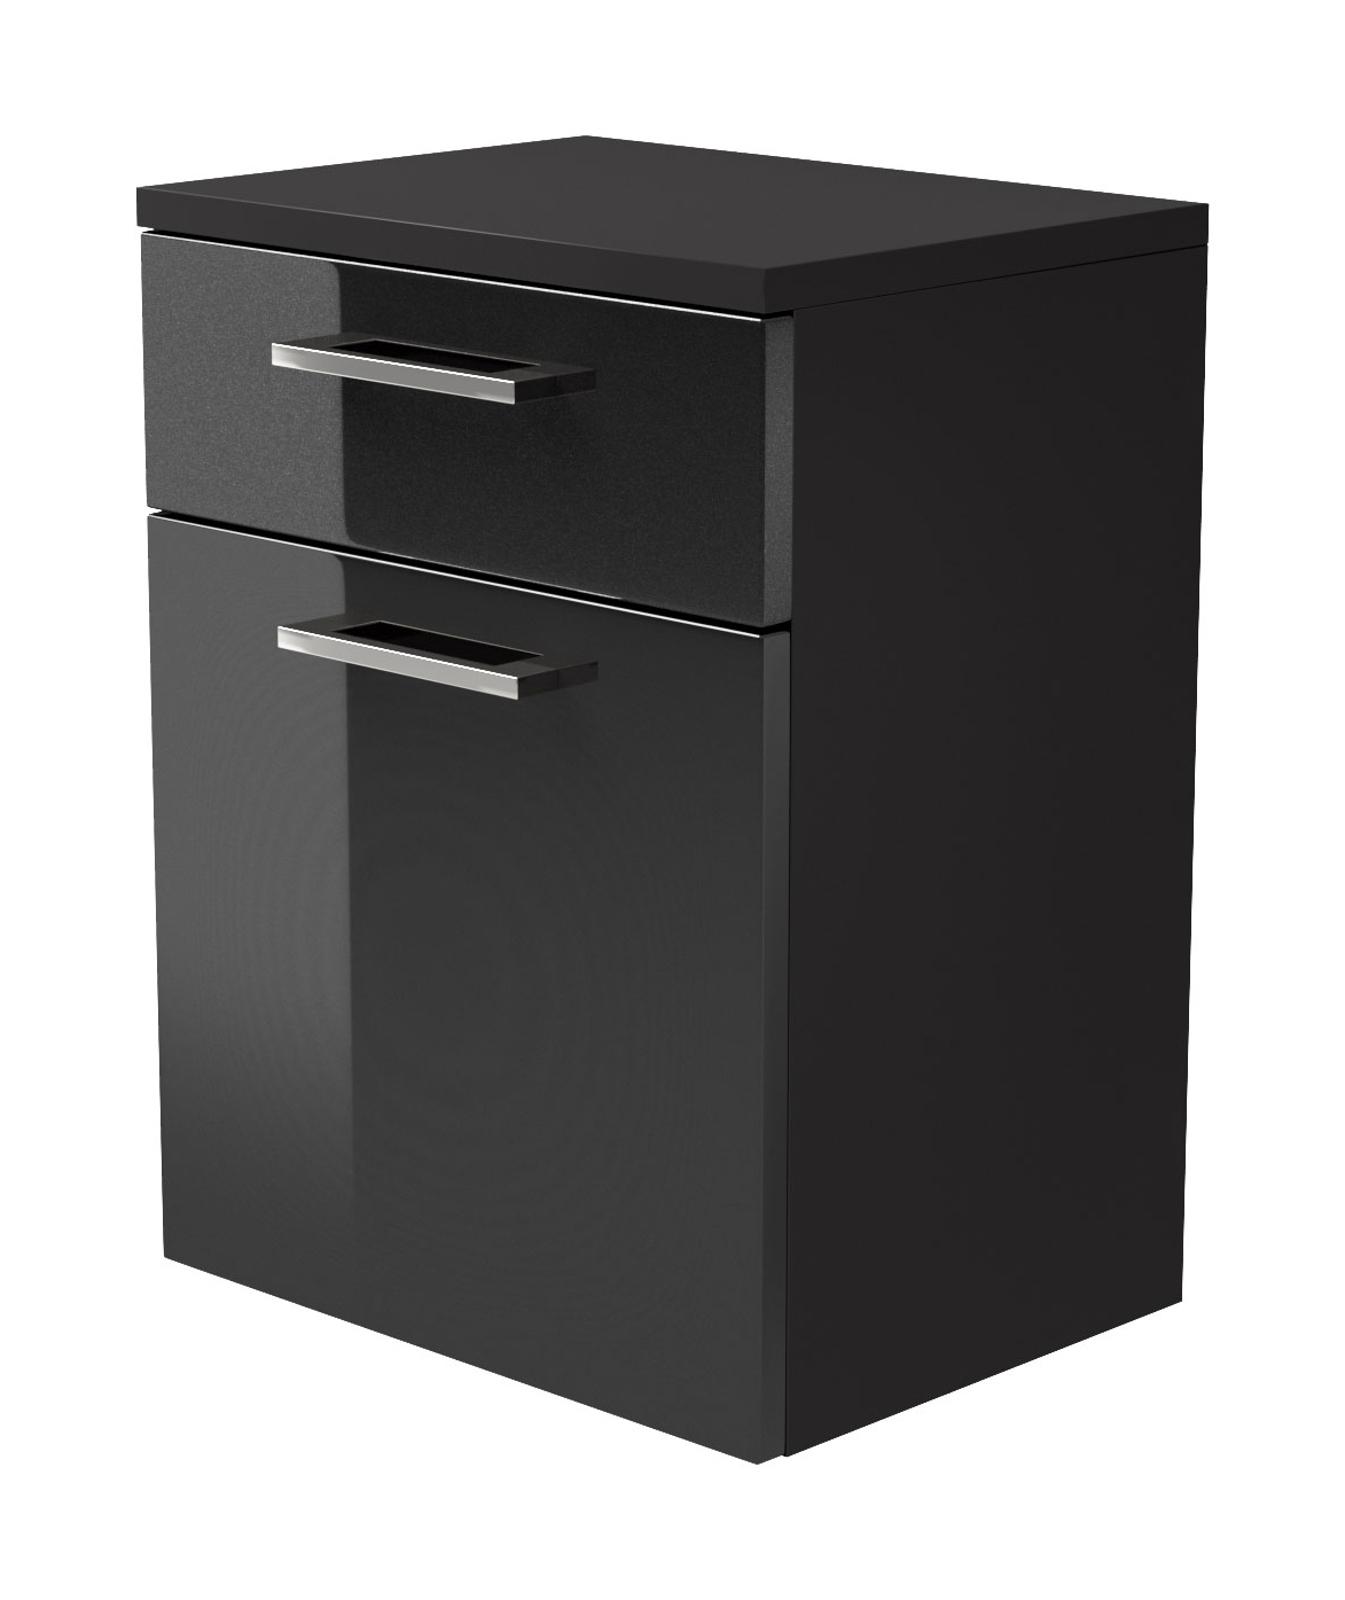 schuhschrank schuhkommode dielenschrank kommode metall wei scarpe ebay. Black Bedroom Furniture Sets. Home Design Ideas